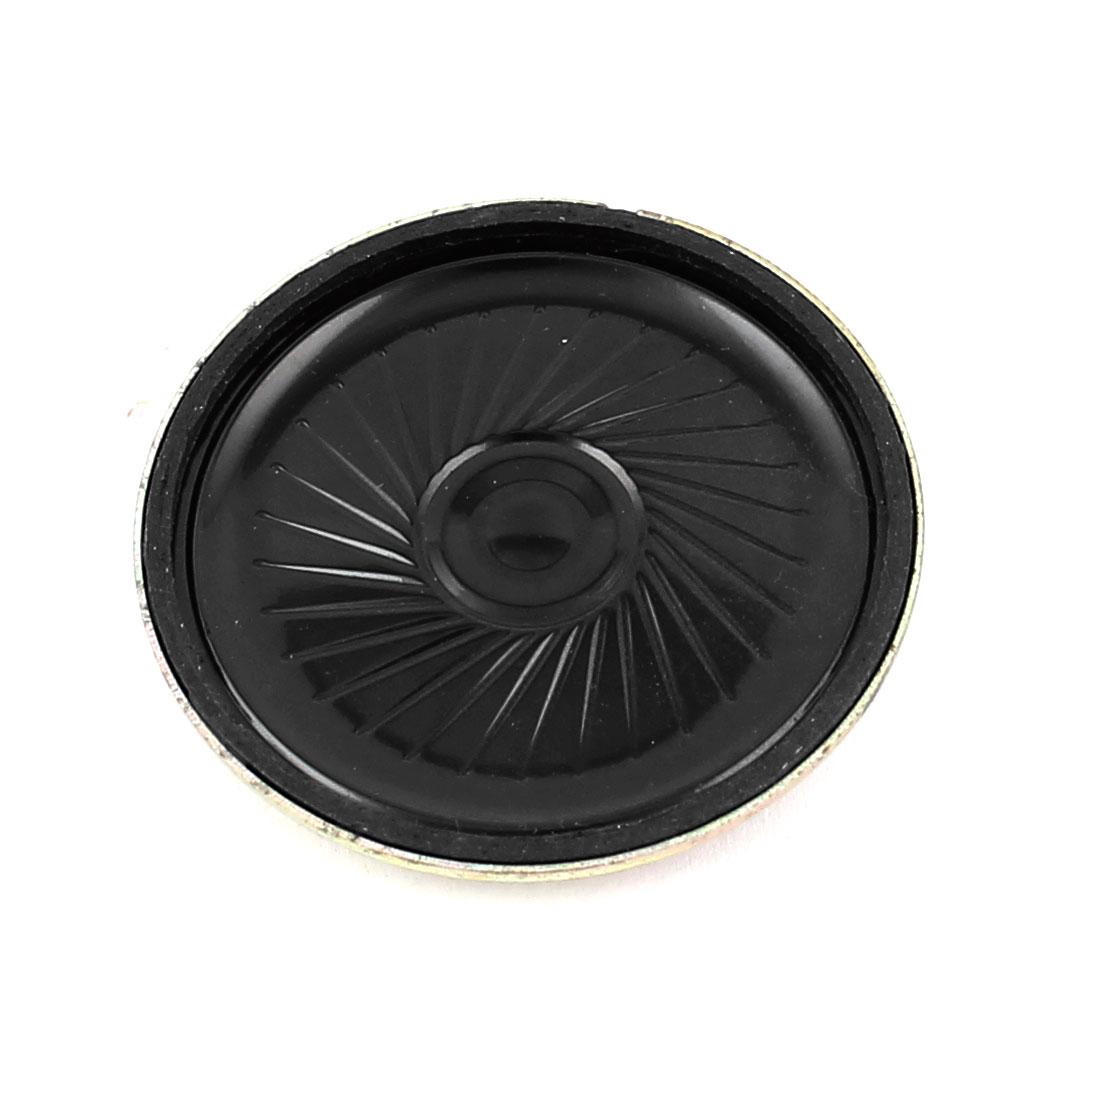 45mm 8 Ohm 0.5W Metal Shell External Magnetic Speaker Loudspeaker Gold Tone